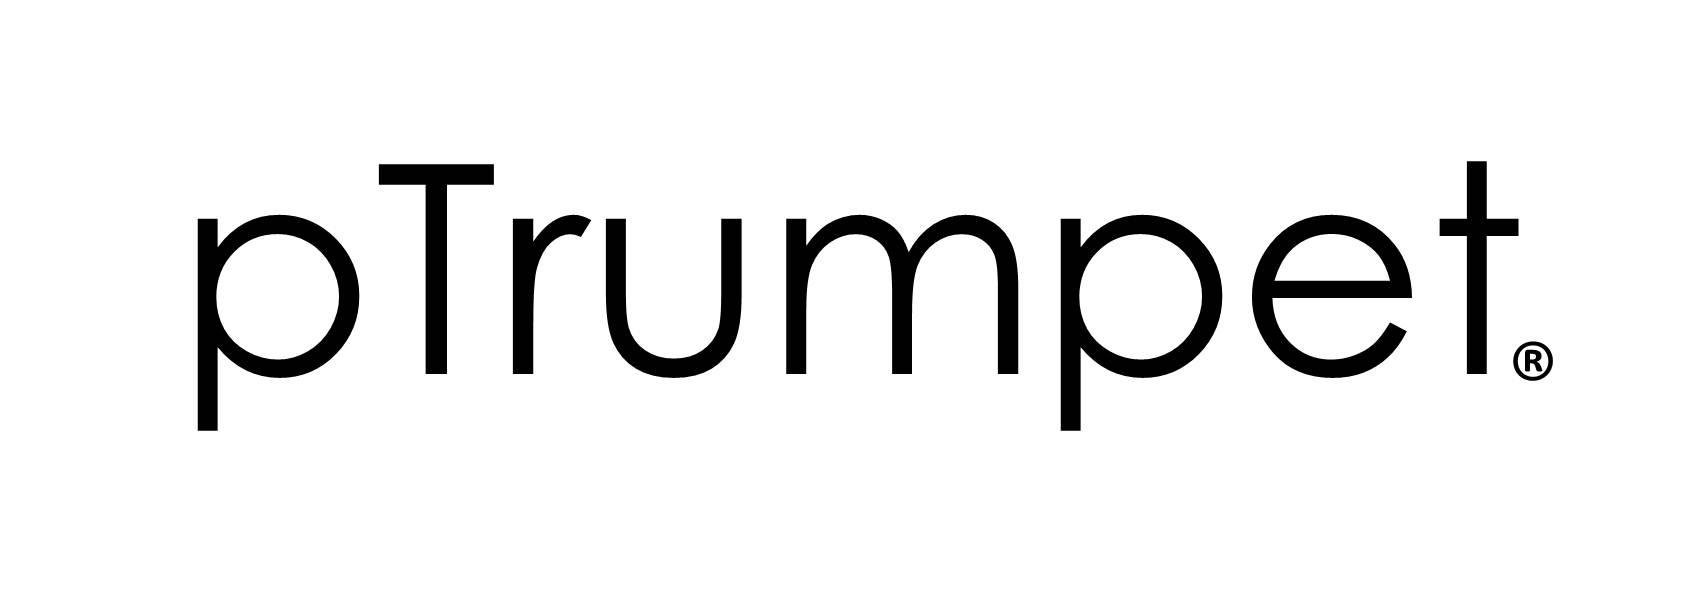 p-trumpet-1434.jpg